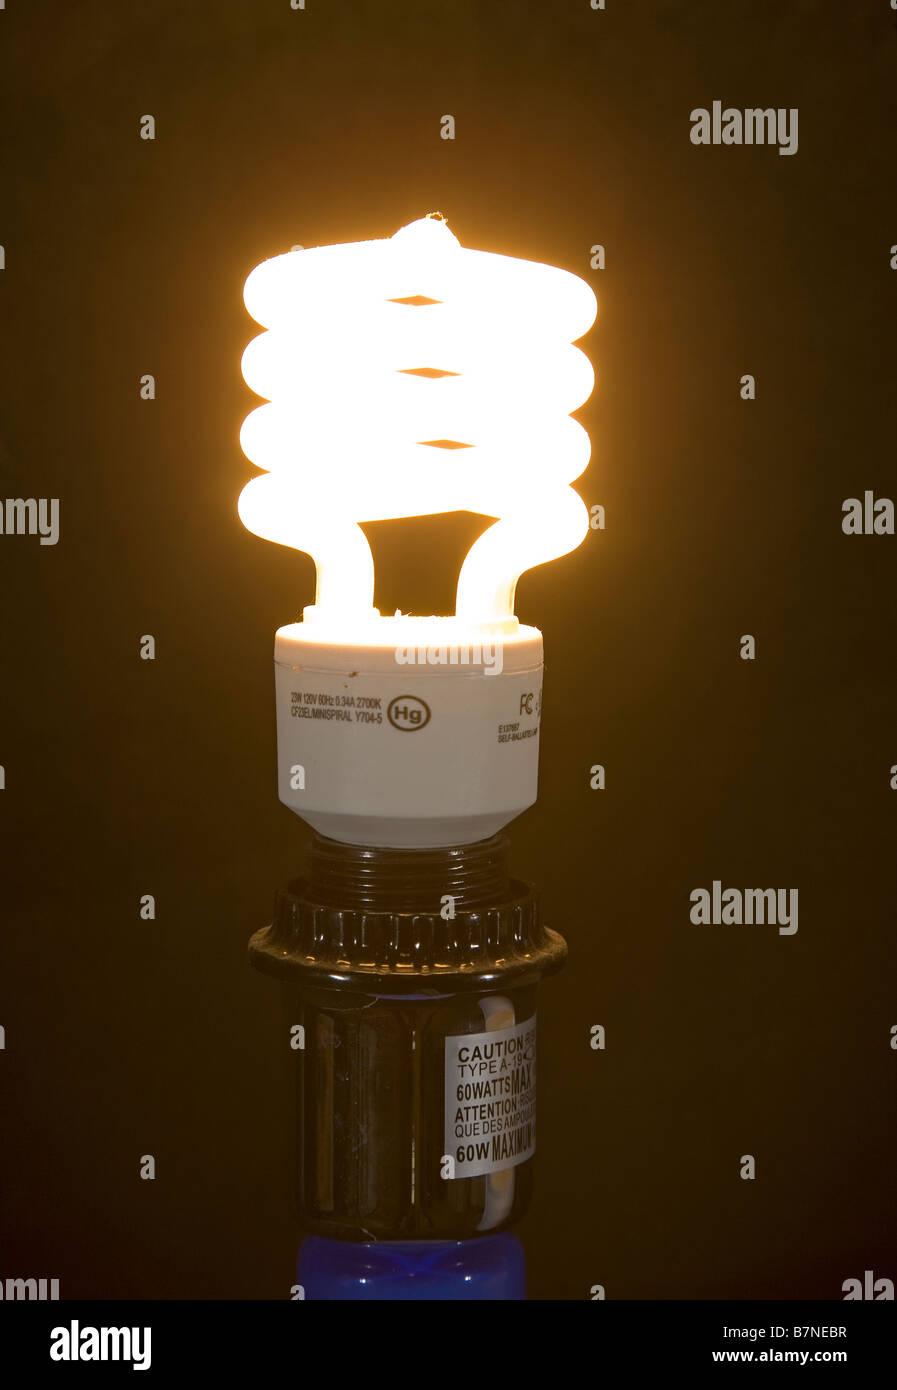 A 23 watt low energy green minispiral self ballasted light bulb or lamp - Stock Image